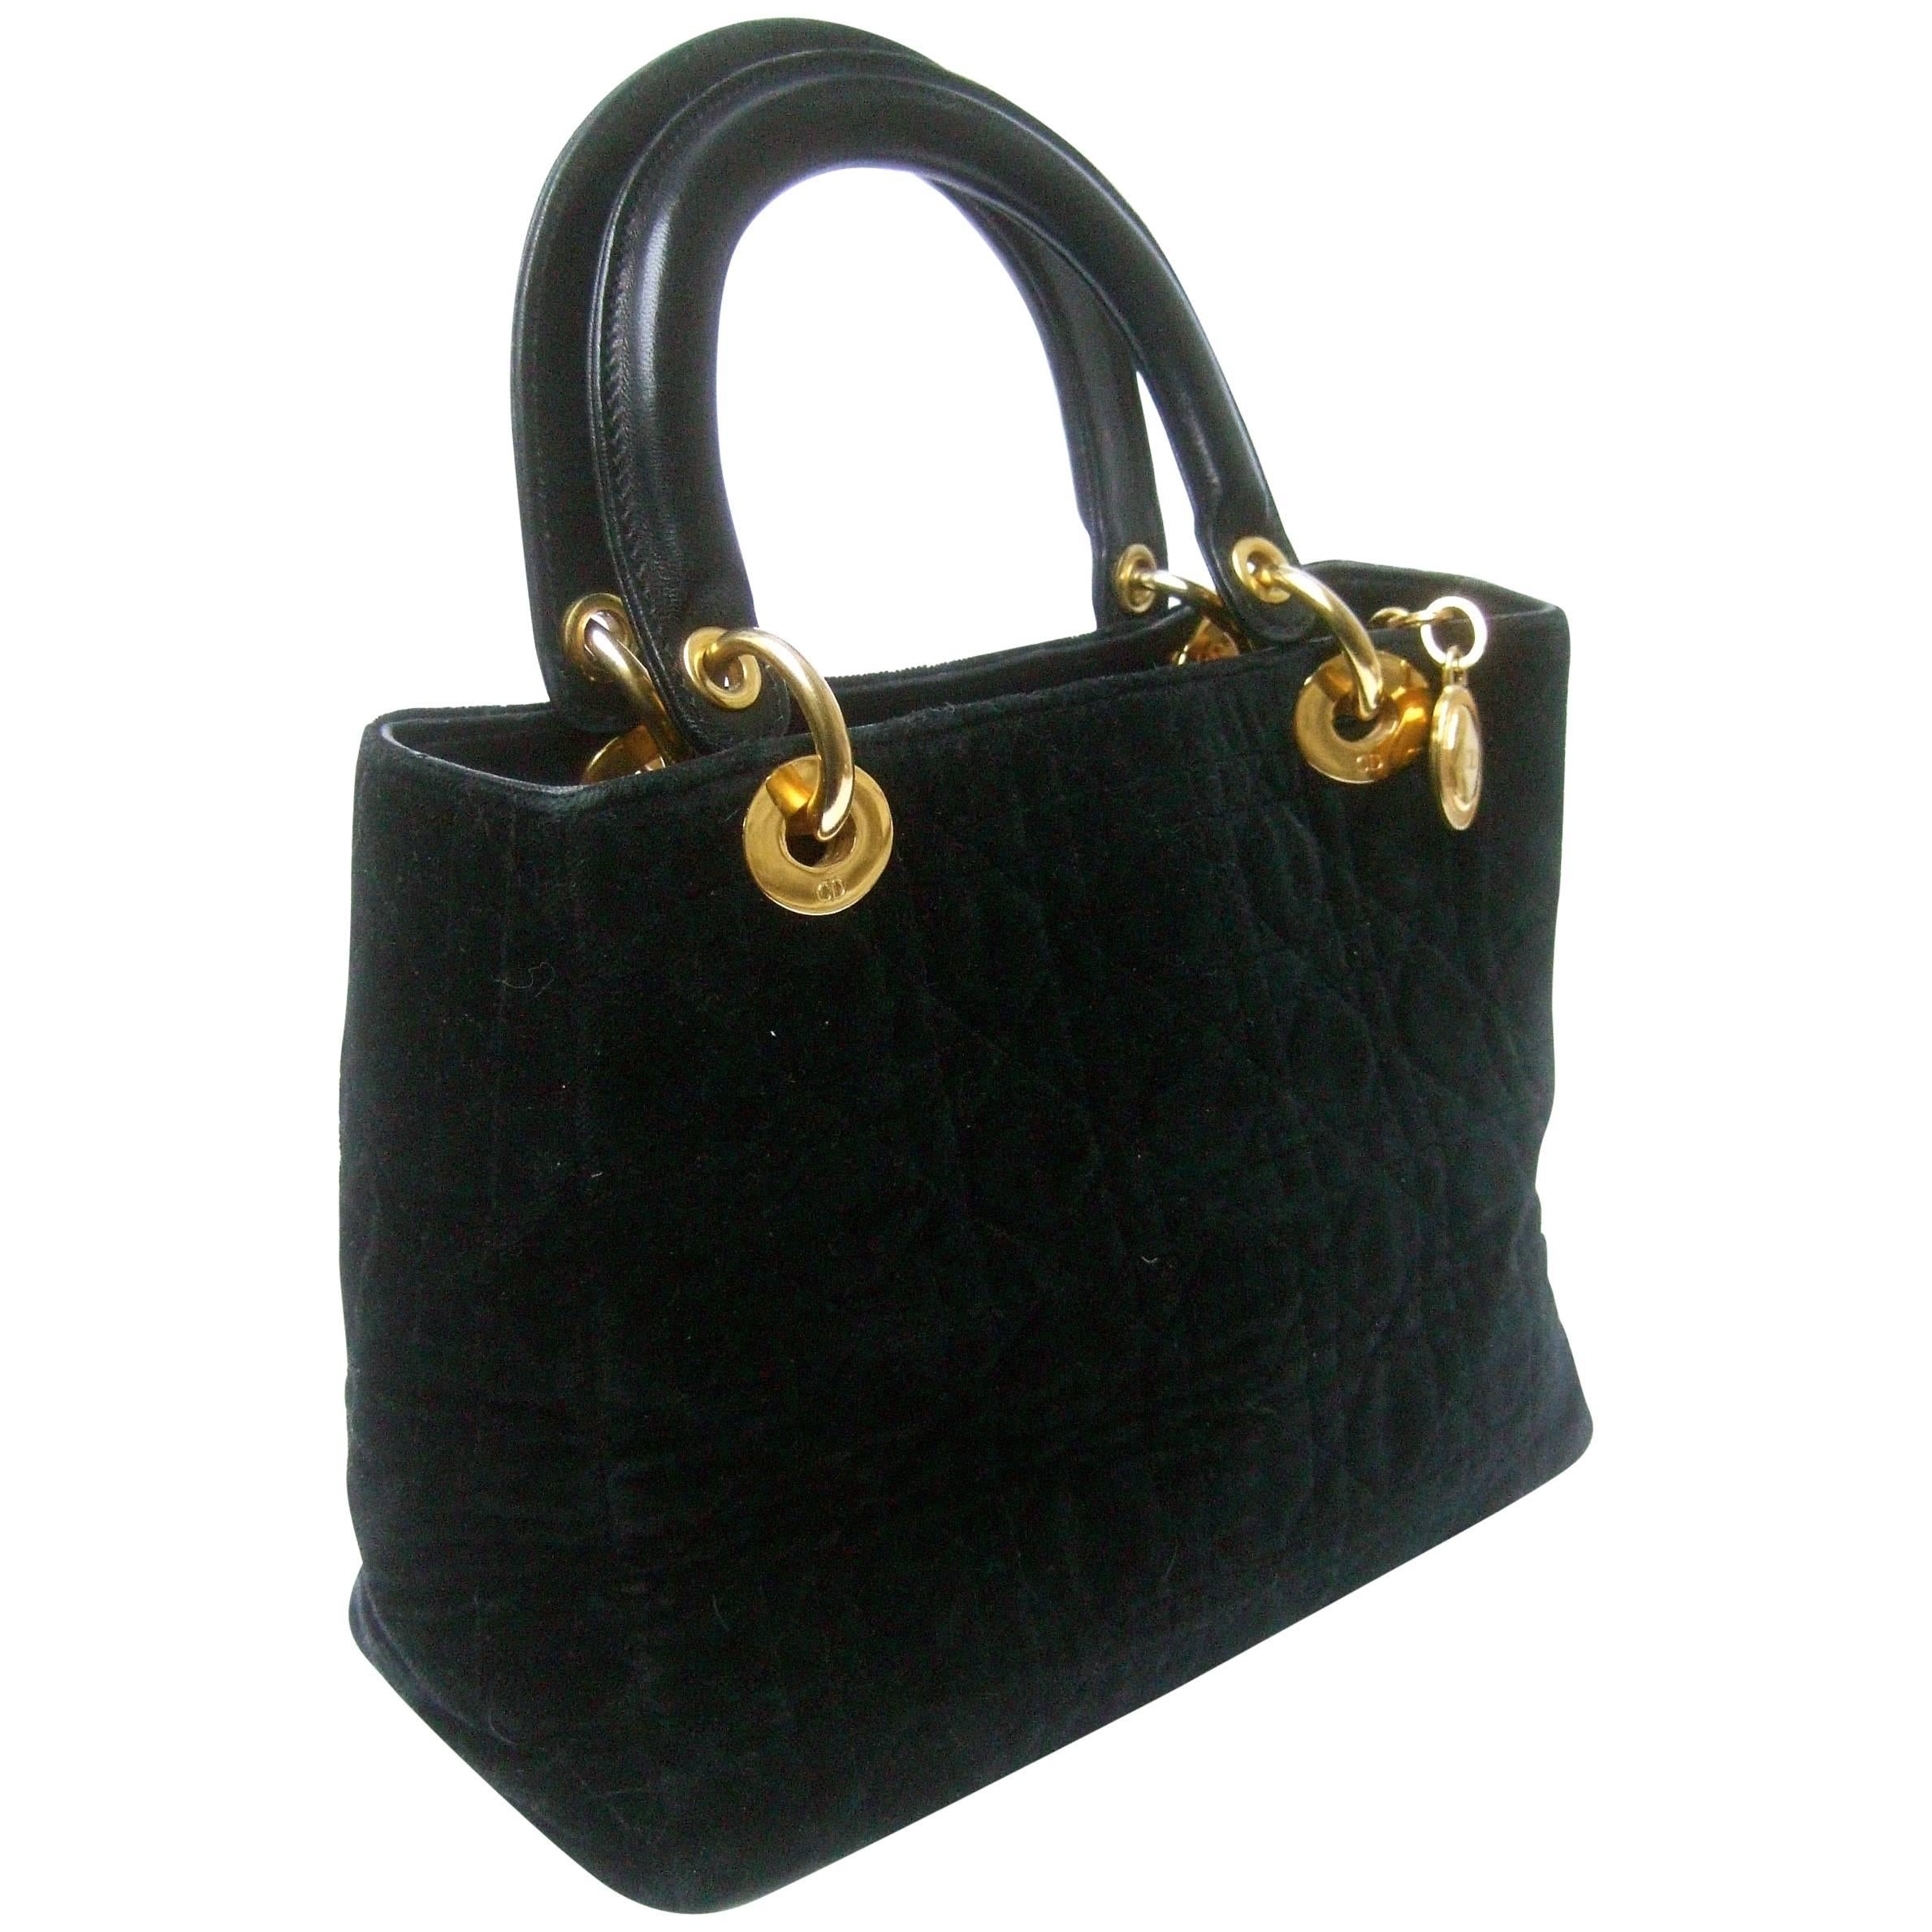 2dd1e186293 Christian Dior Lady Dior Mini Black Nylon Bag With Gold Tone Hardware at  1stdibs